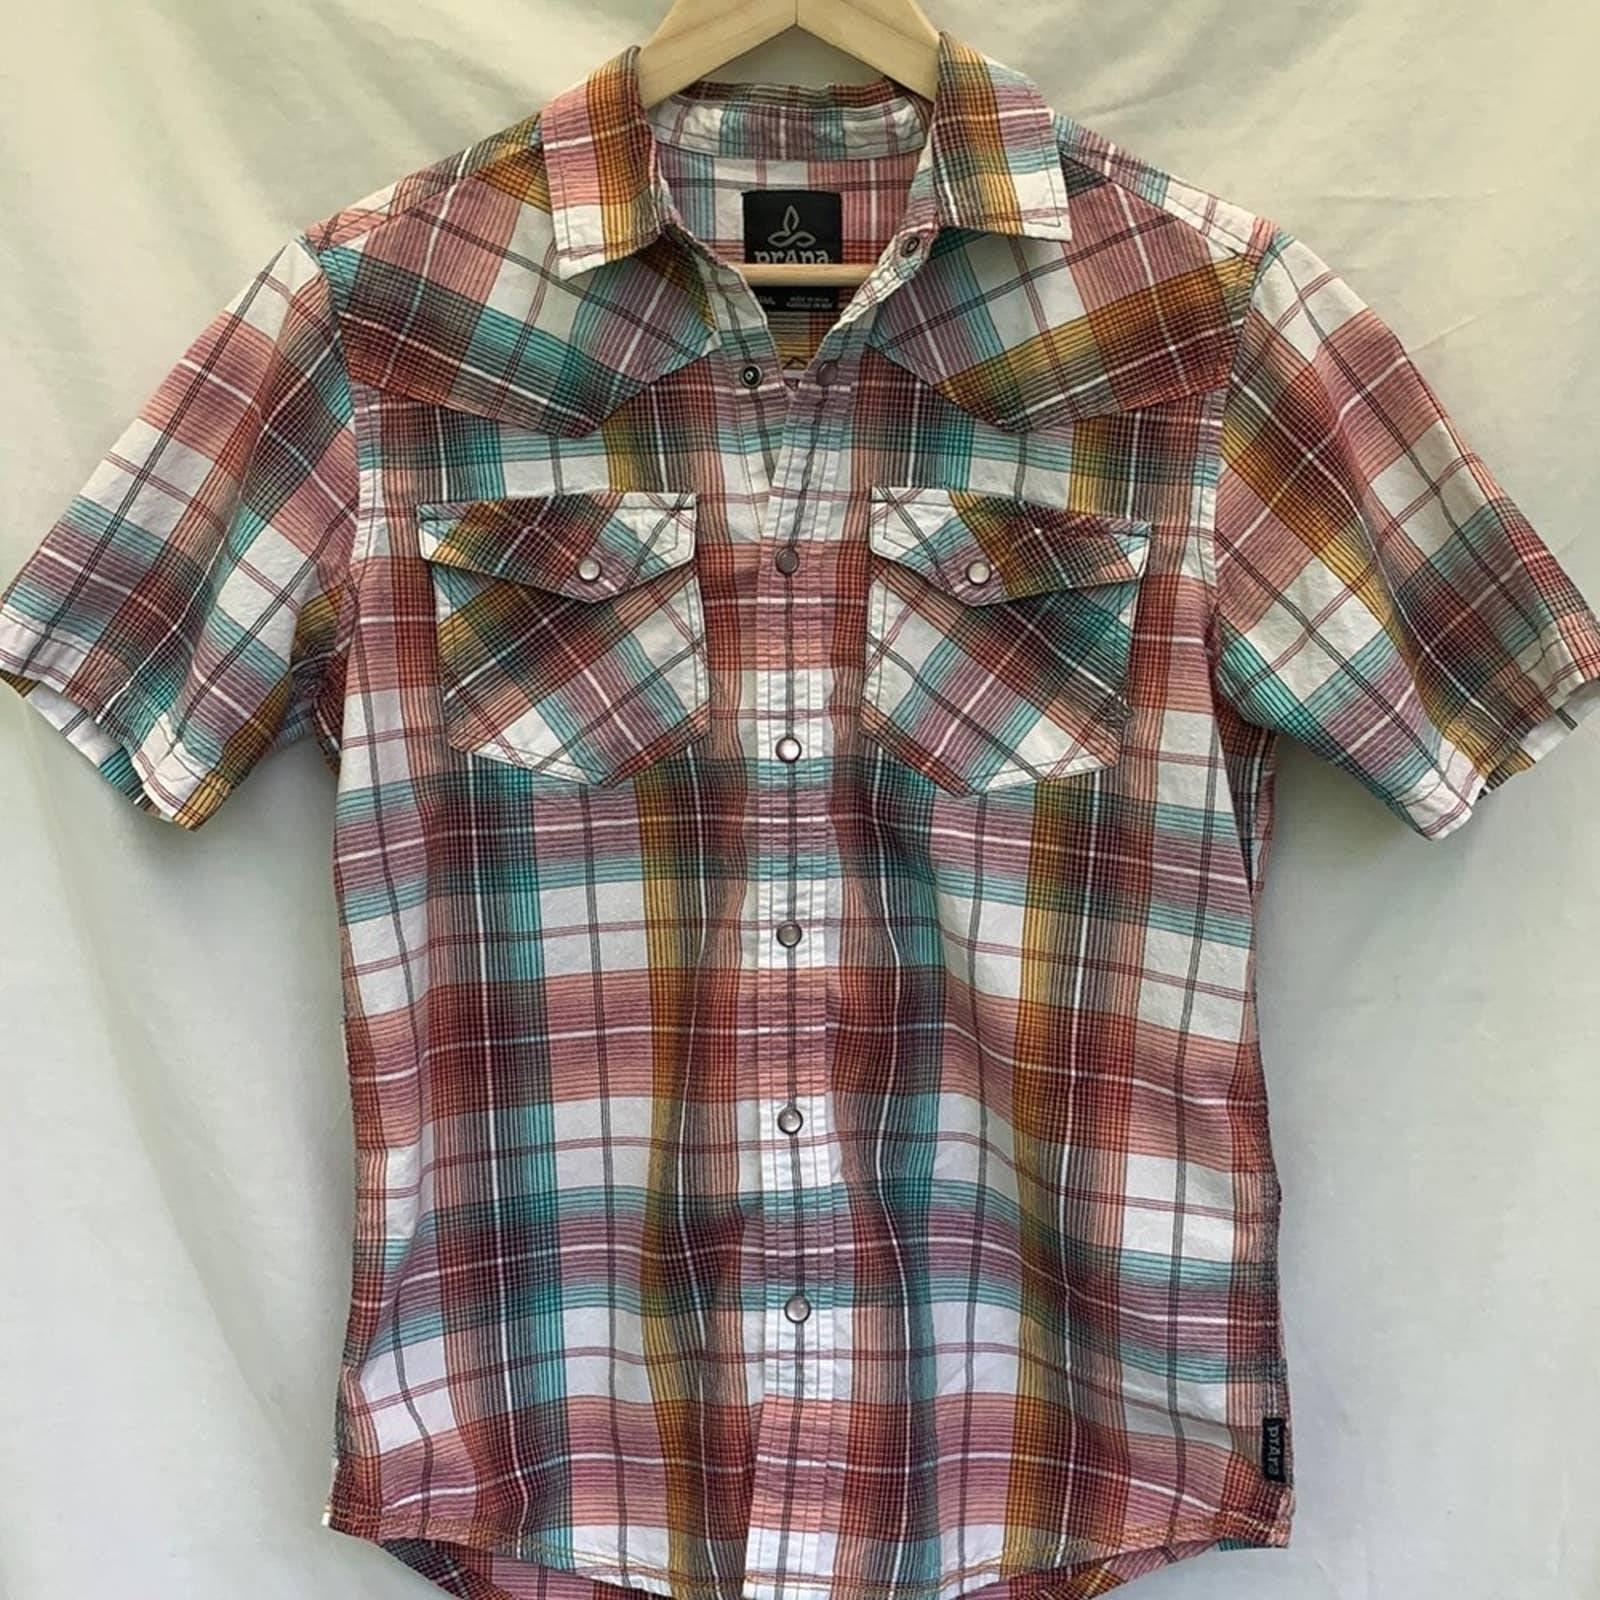 Prana - Western Style Plaid Shirt - S